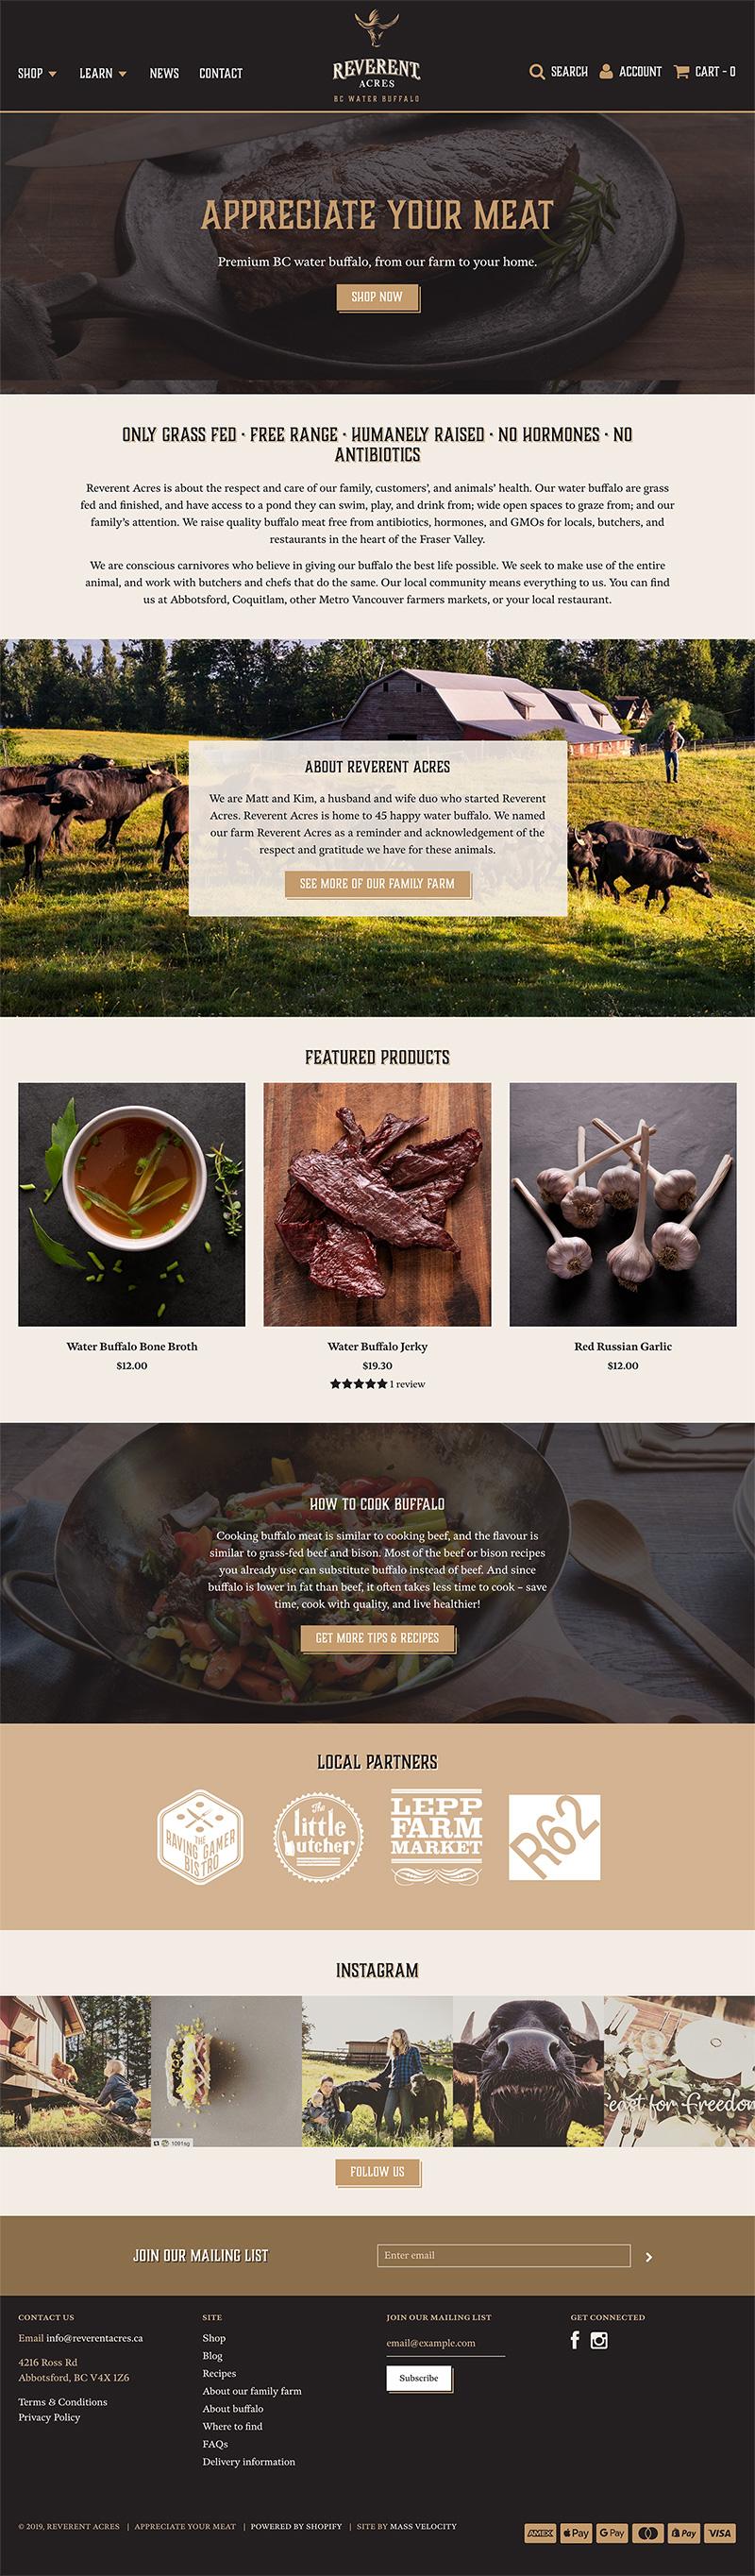 Reverent Acres Website